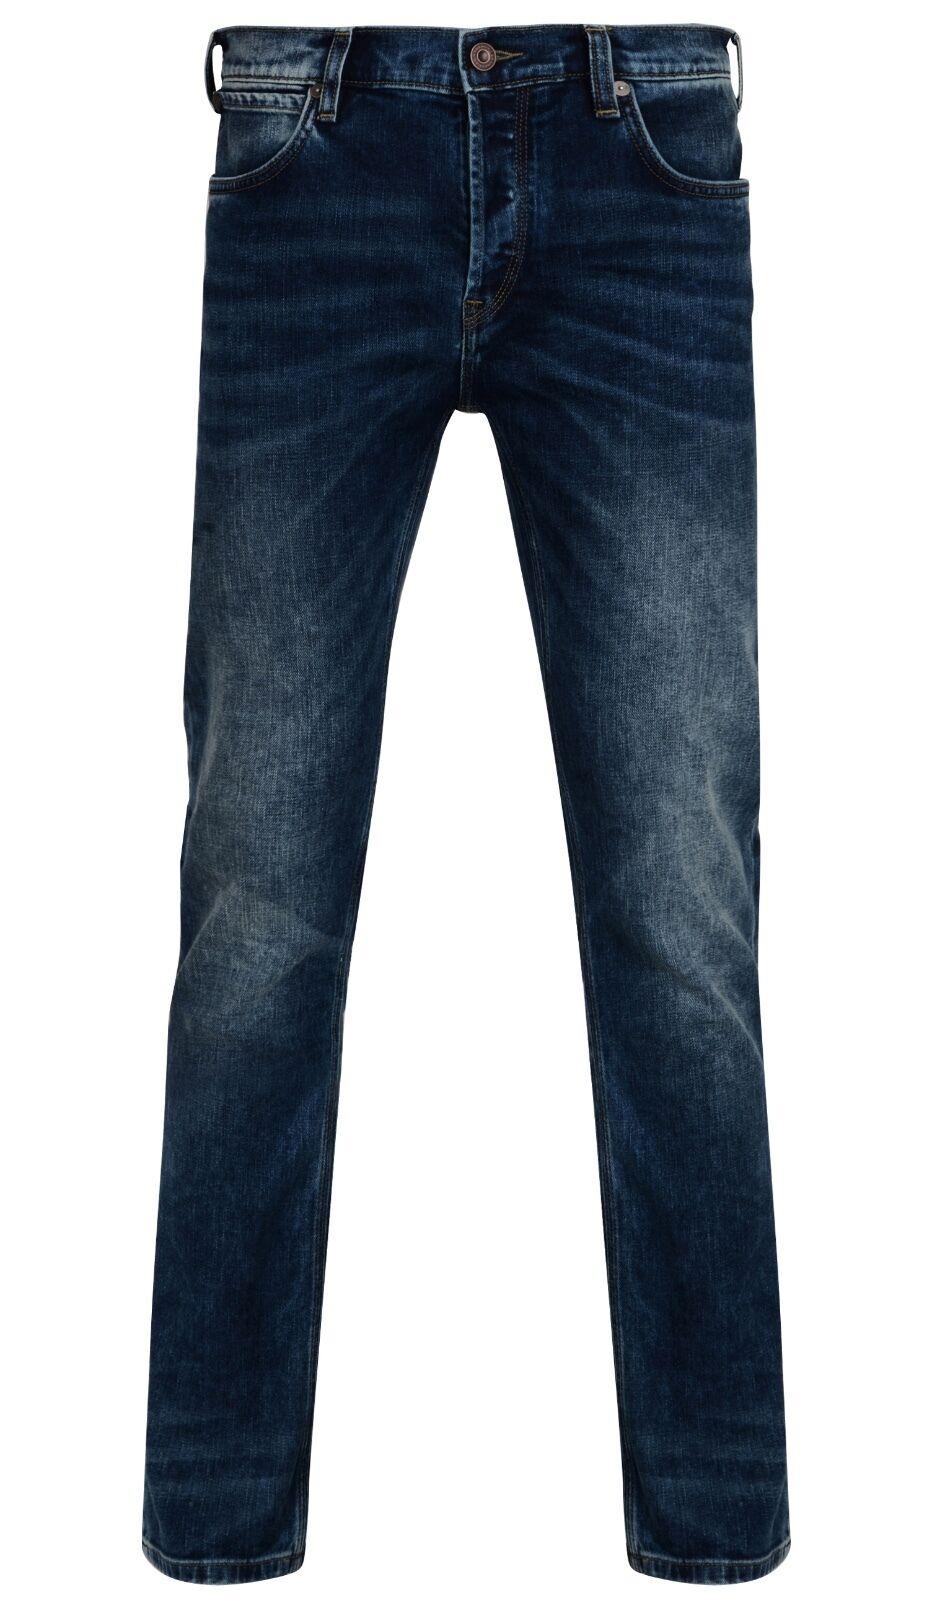 French Connection Jeans Indigo 55 Blau Taperot Slim Narrow Leg Denim Pants  | Sale Online  | Feinen Qualität  | Online Shop Europe